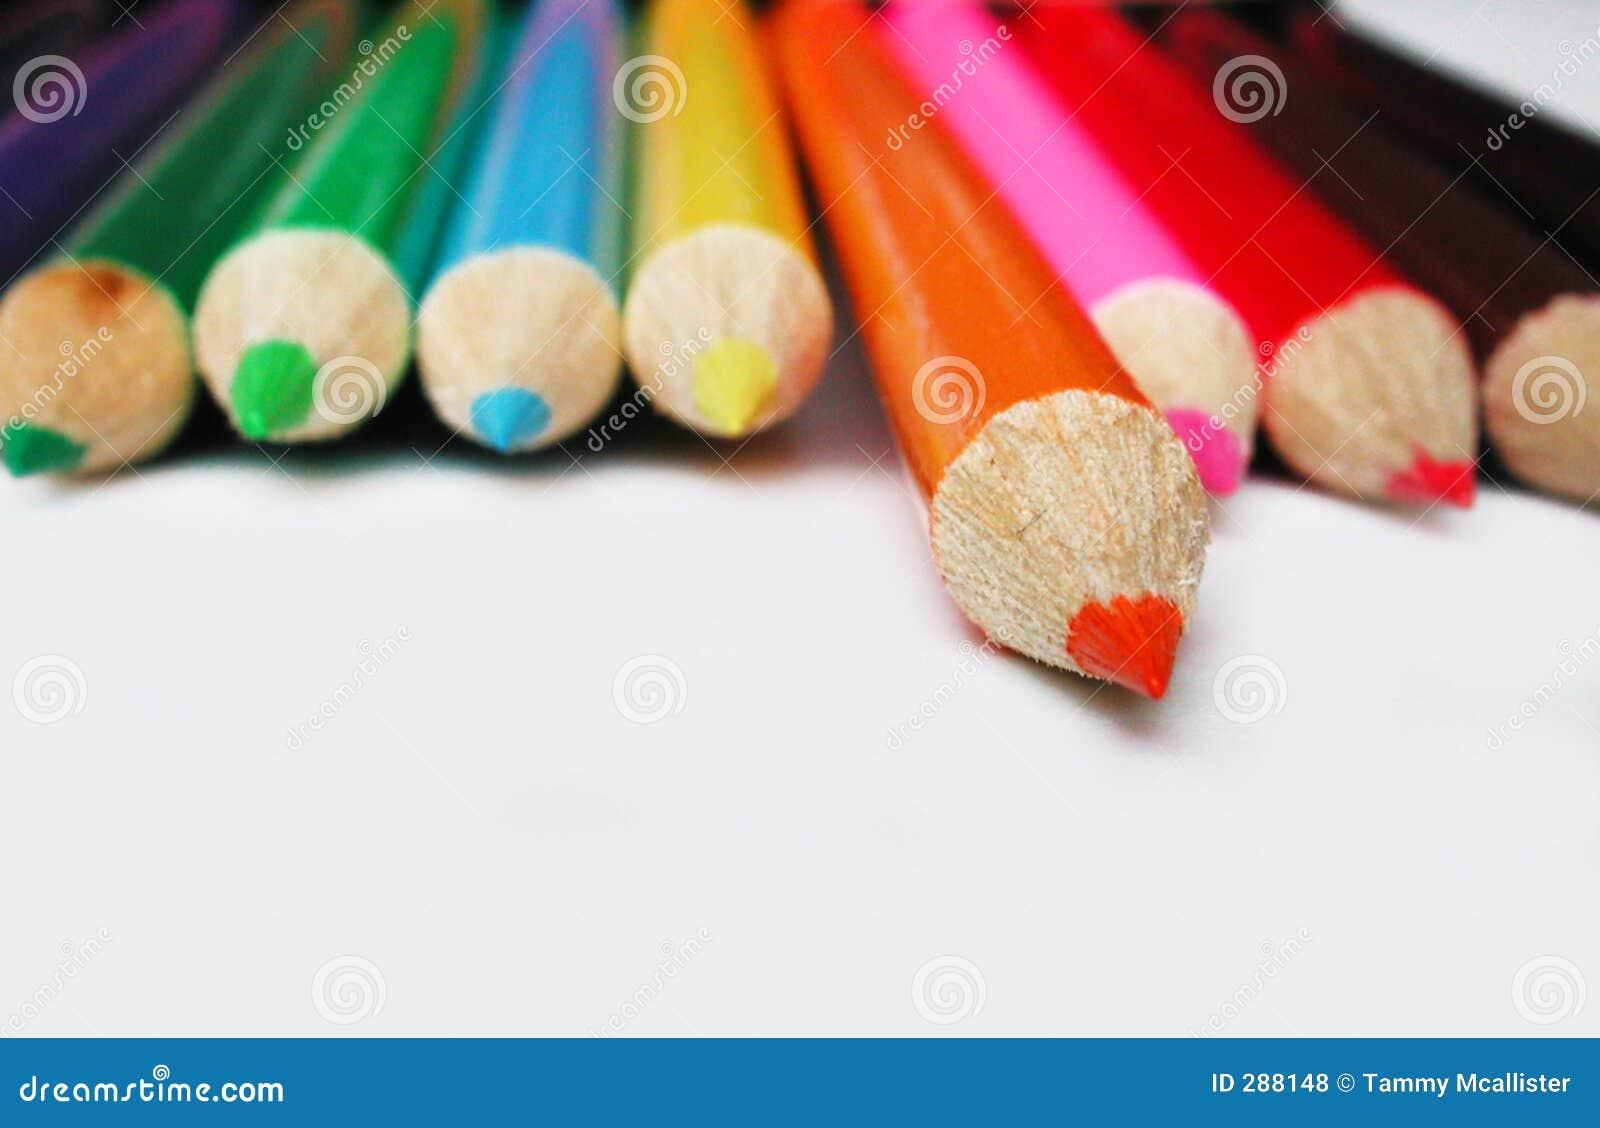 Isolated orange pencil crayon